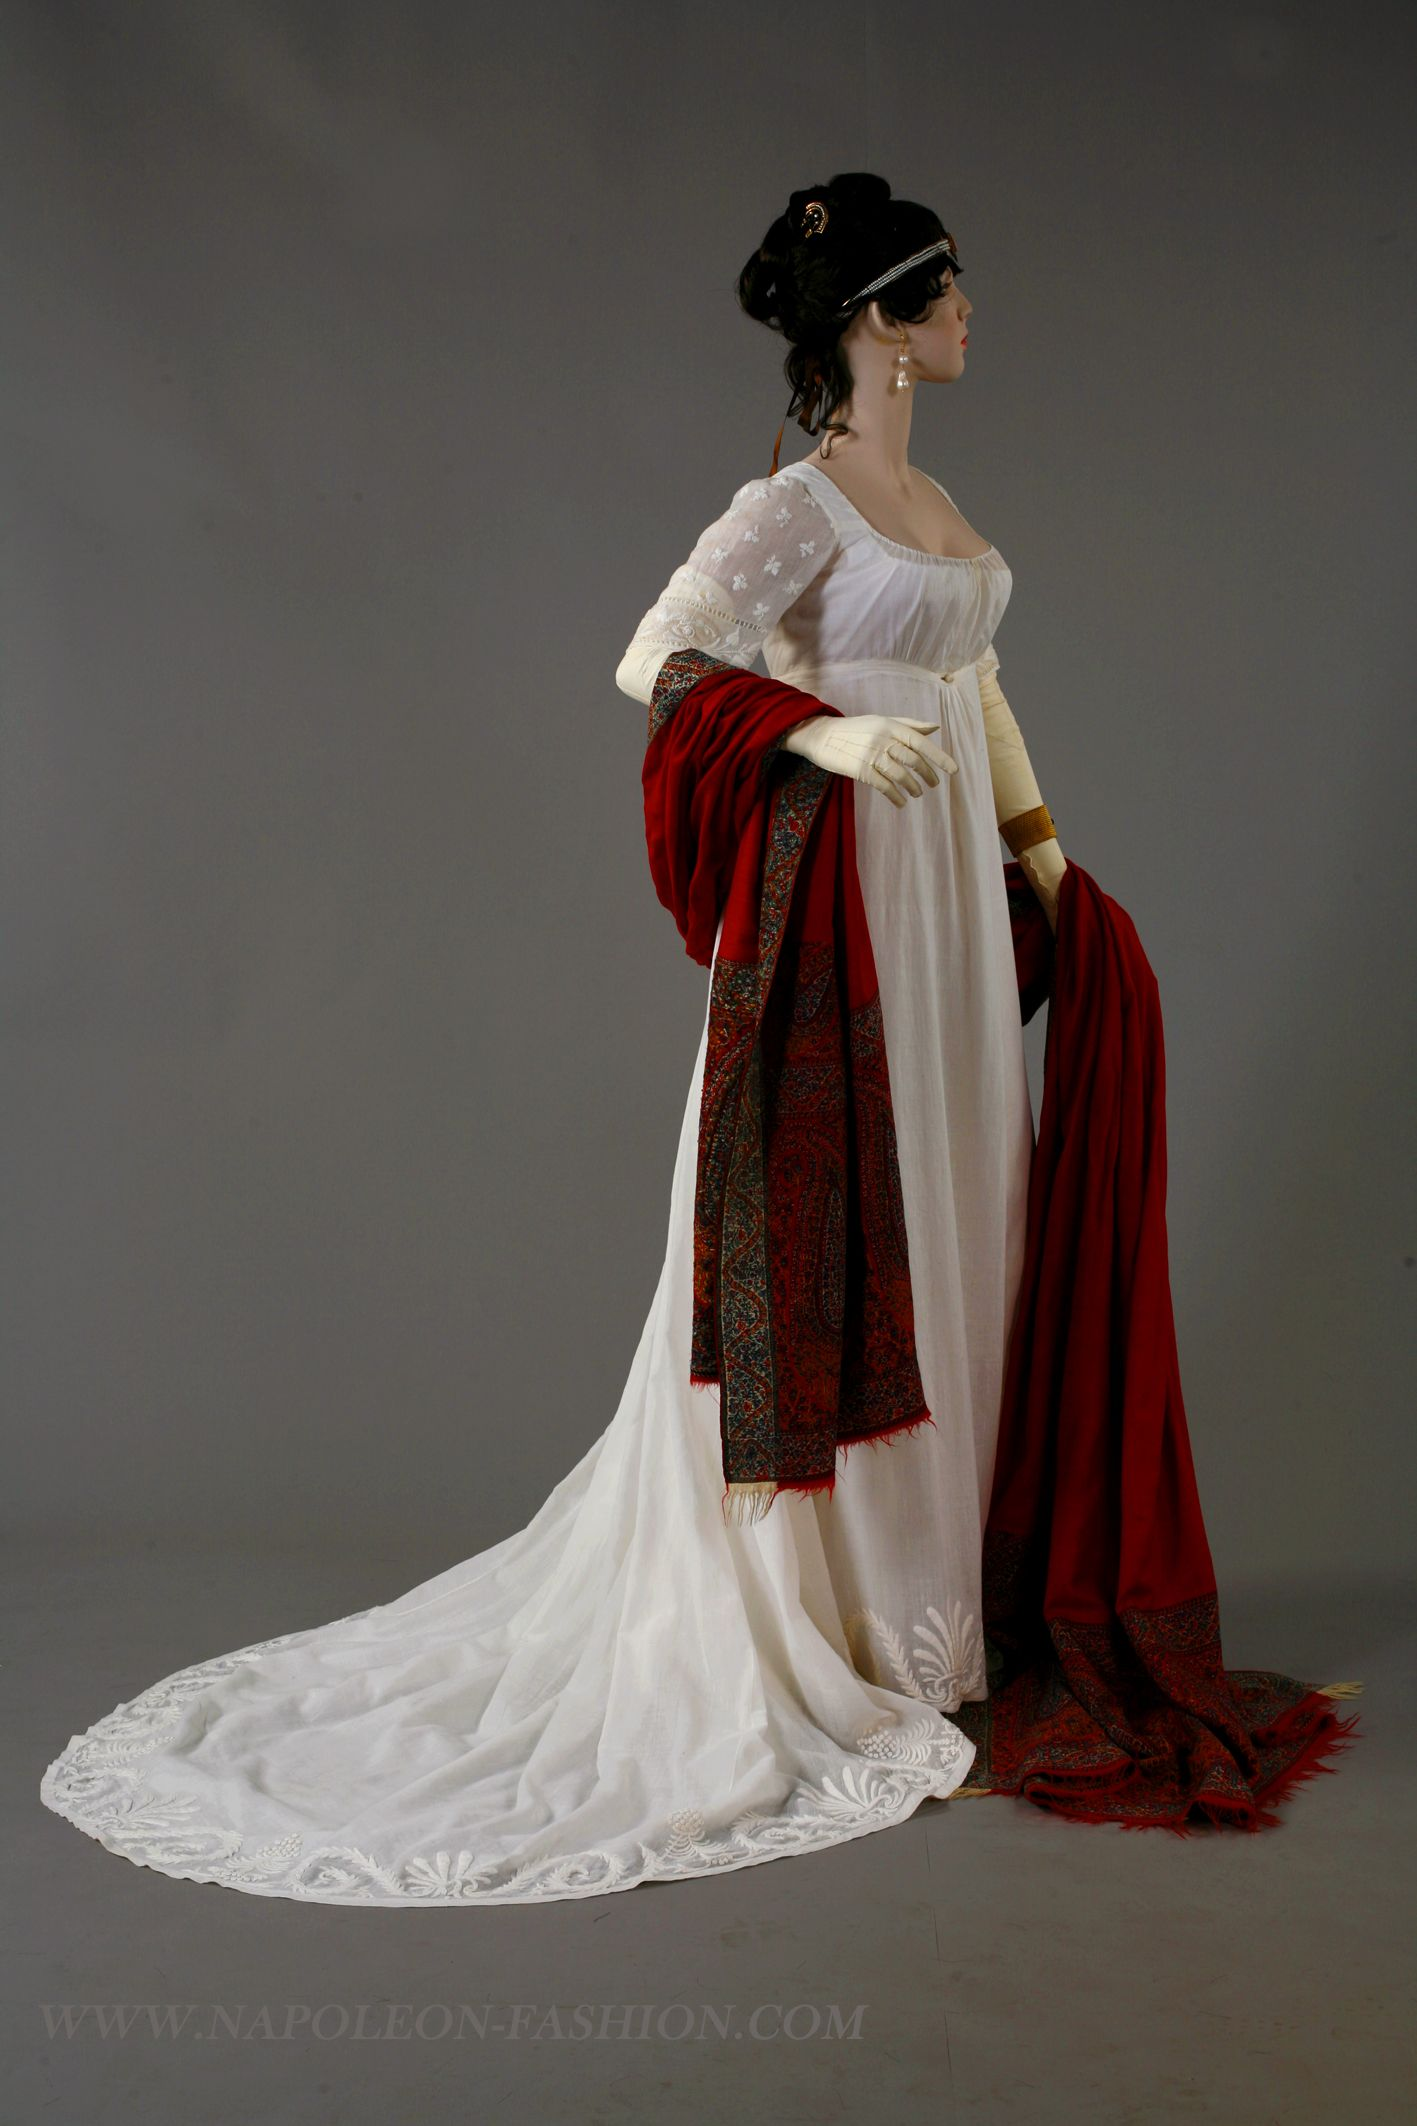 Regency era costume history pinterest napoleon regency and empire